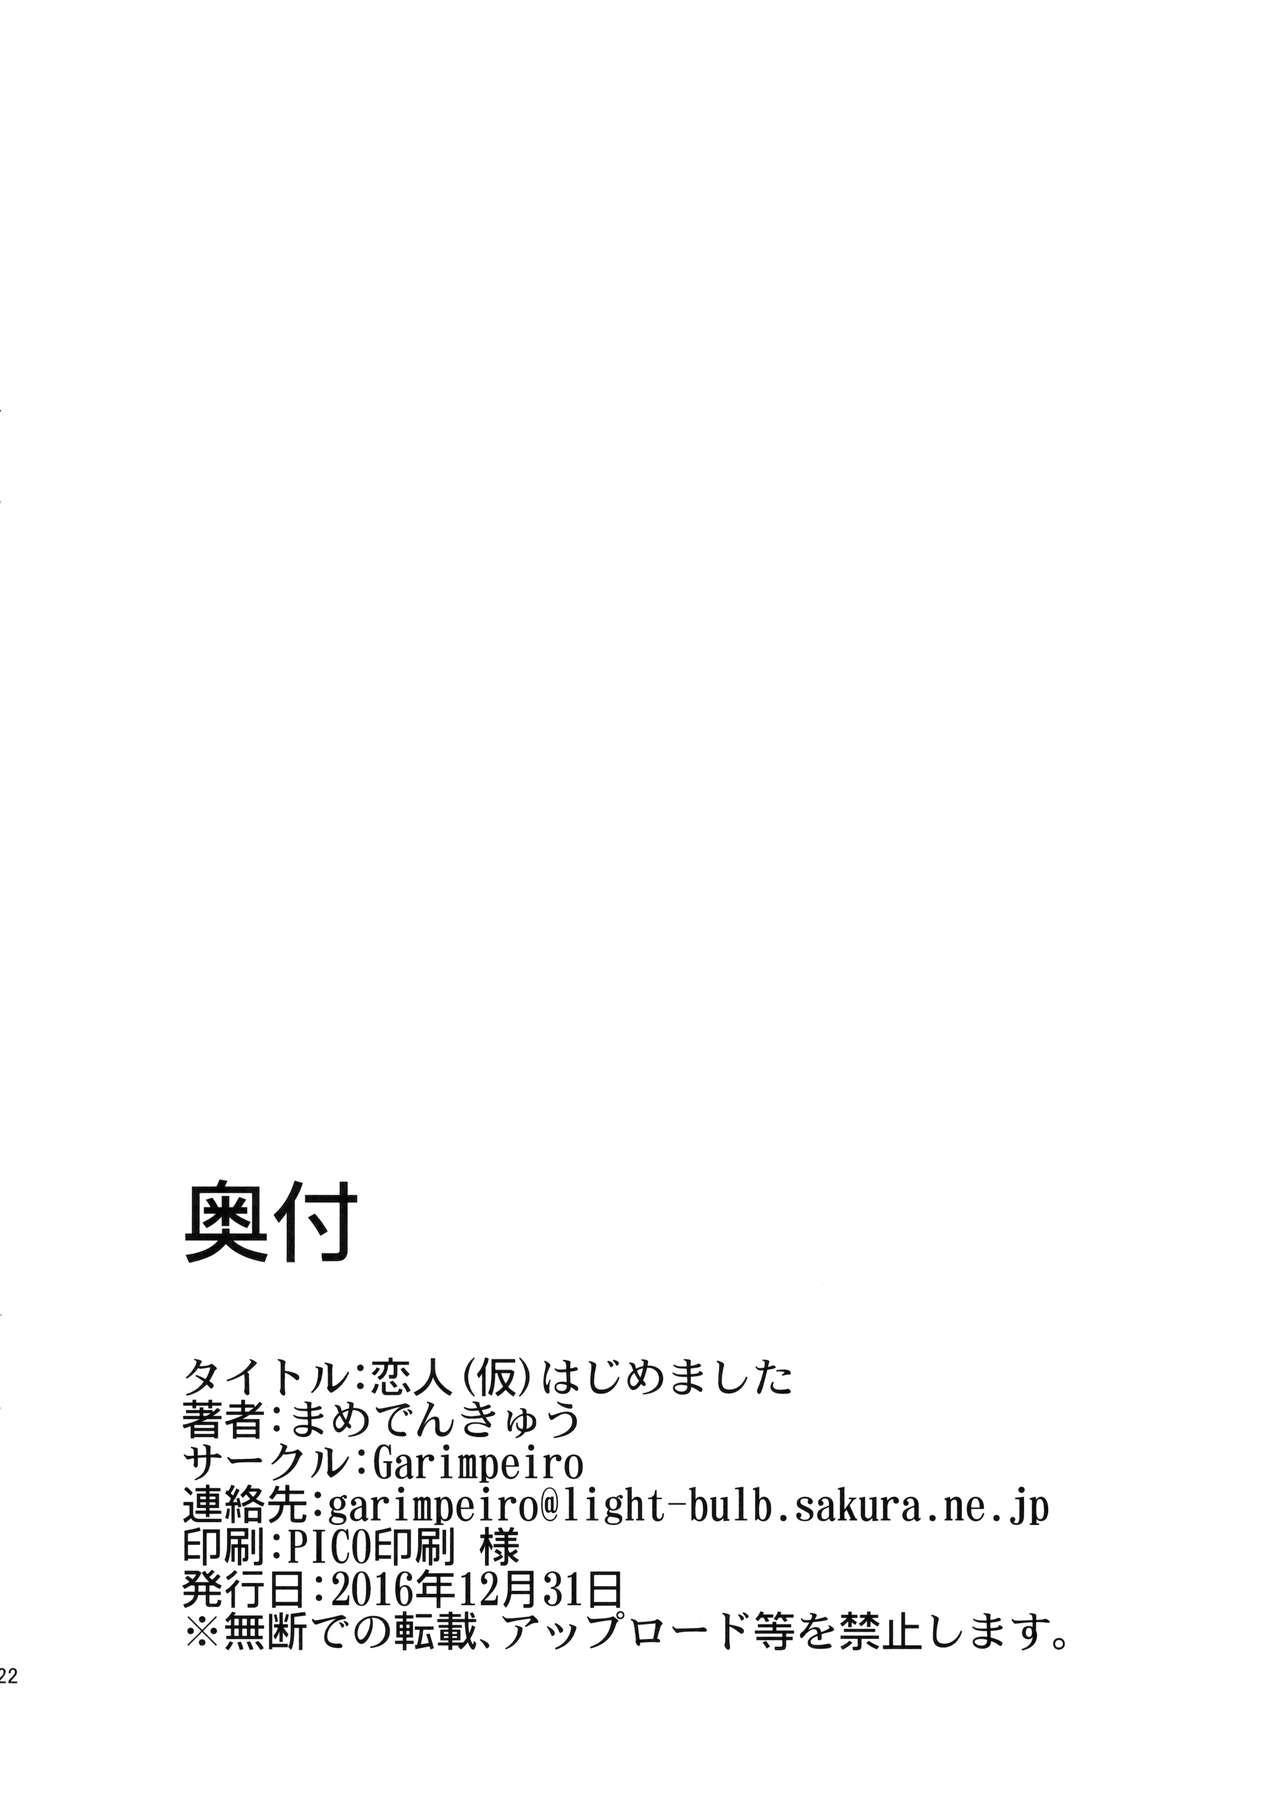 (C91) [Garimpeiro (Mame Denkyuu)] Koibito (kari) Hajimemashita | Becoming lovers (temp) (THE IDOLM@STER CINDERELLA GIRLS) [English] [L-san] 20